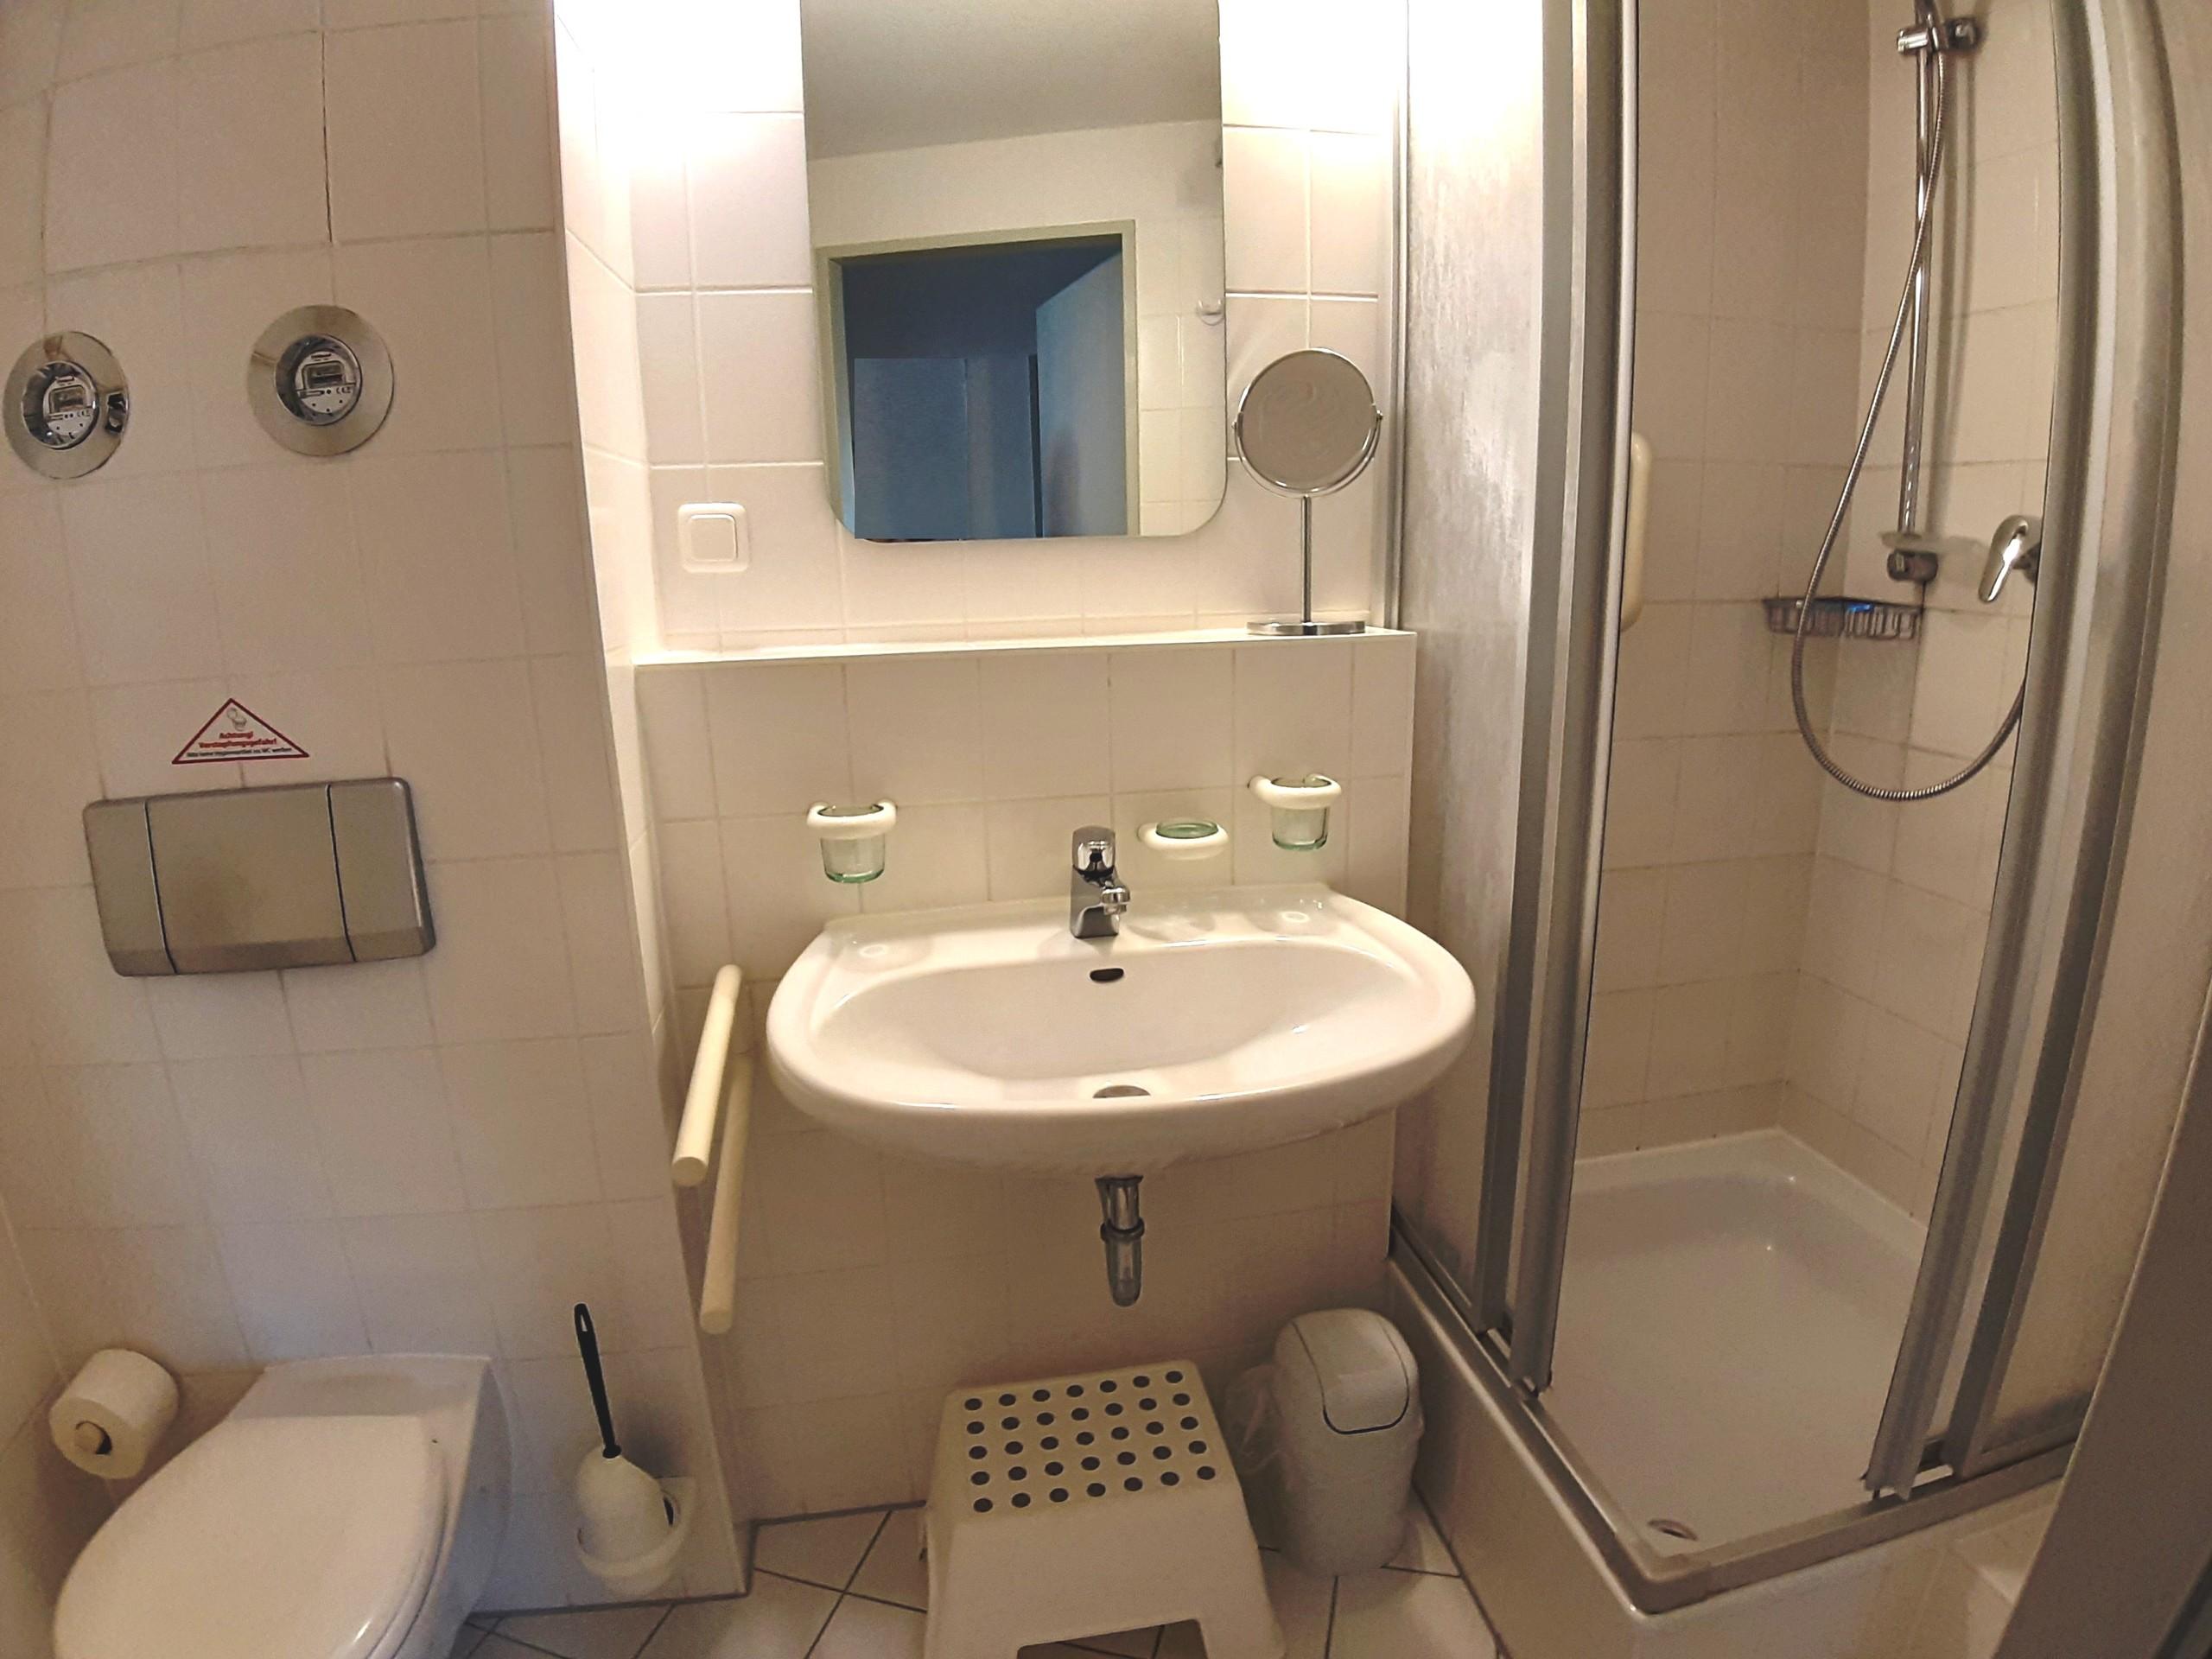 Sauberes und geräumiges Bad